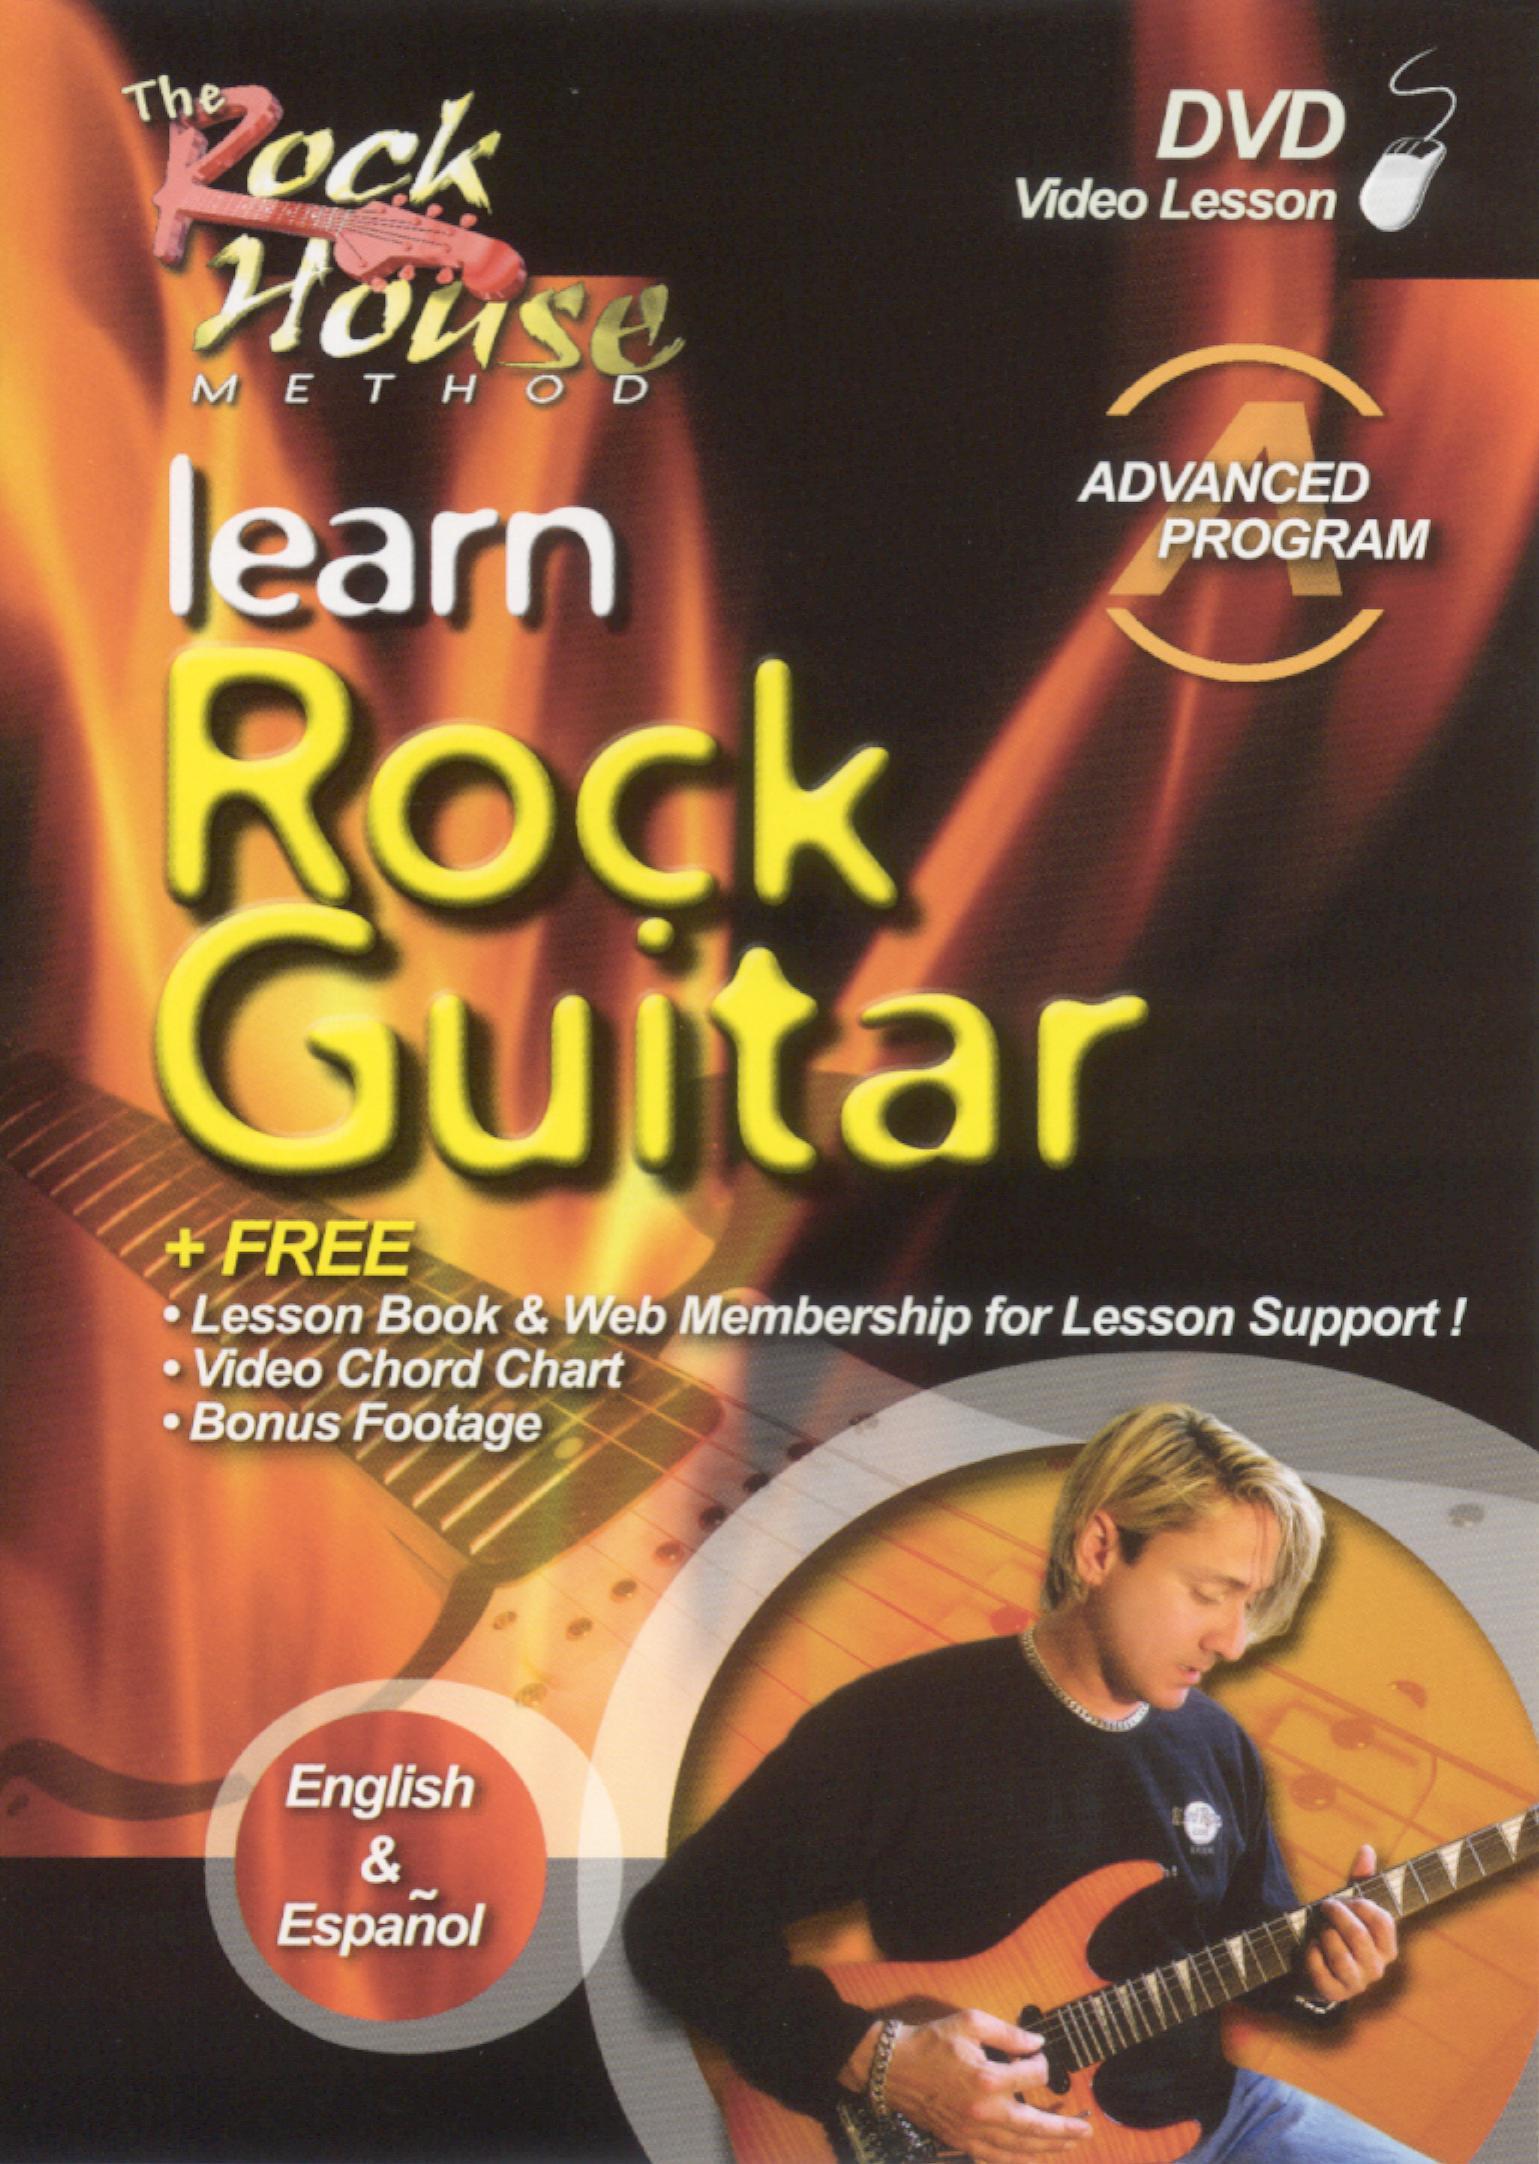 The Rock House Method: Learn Rock Guitar Advanced